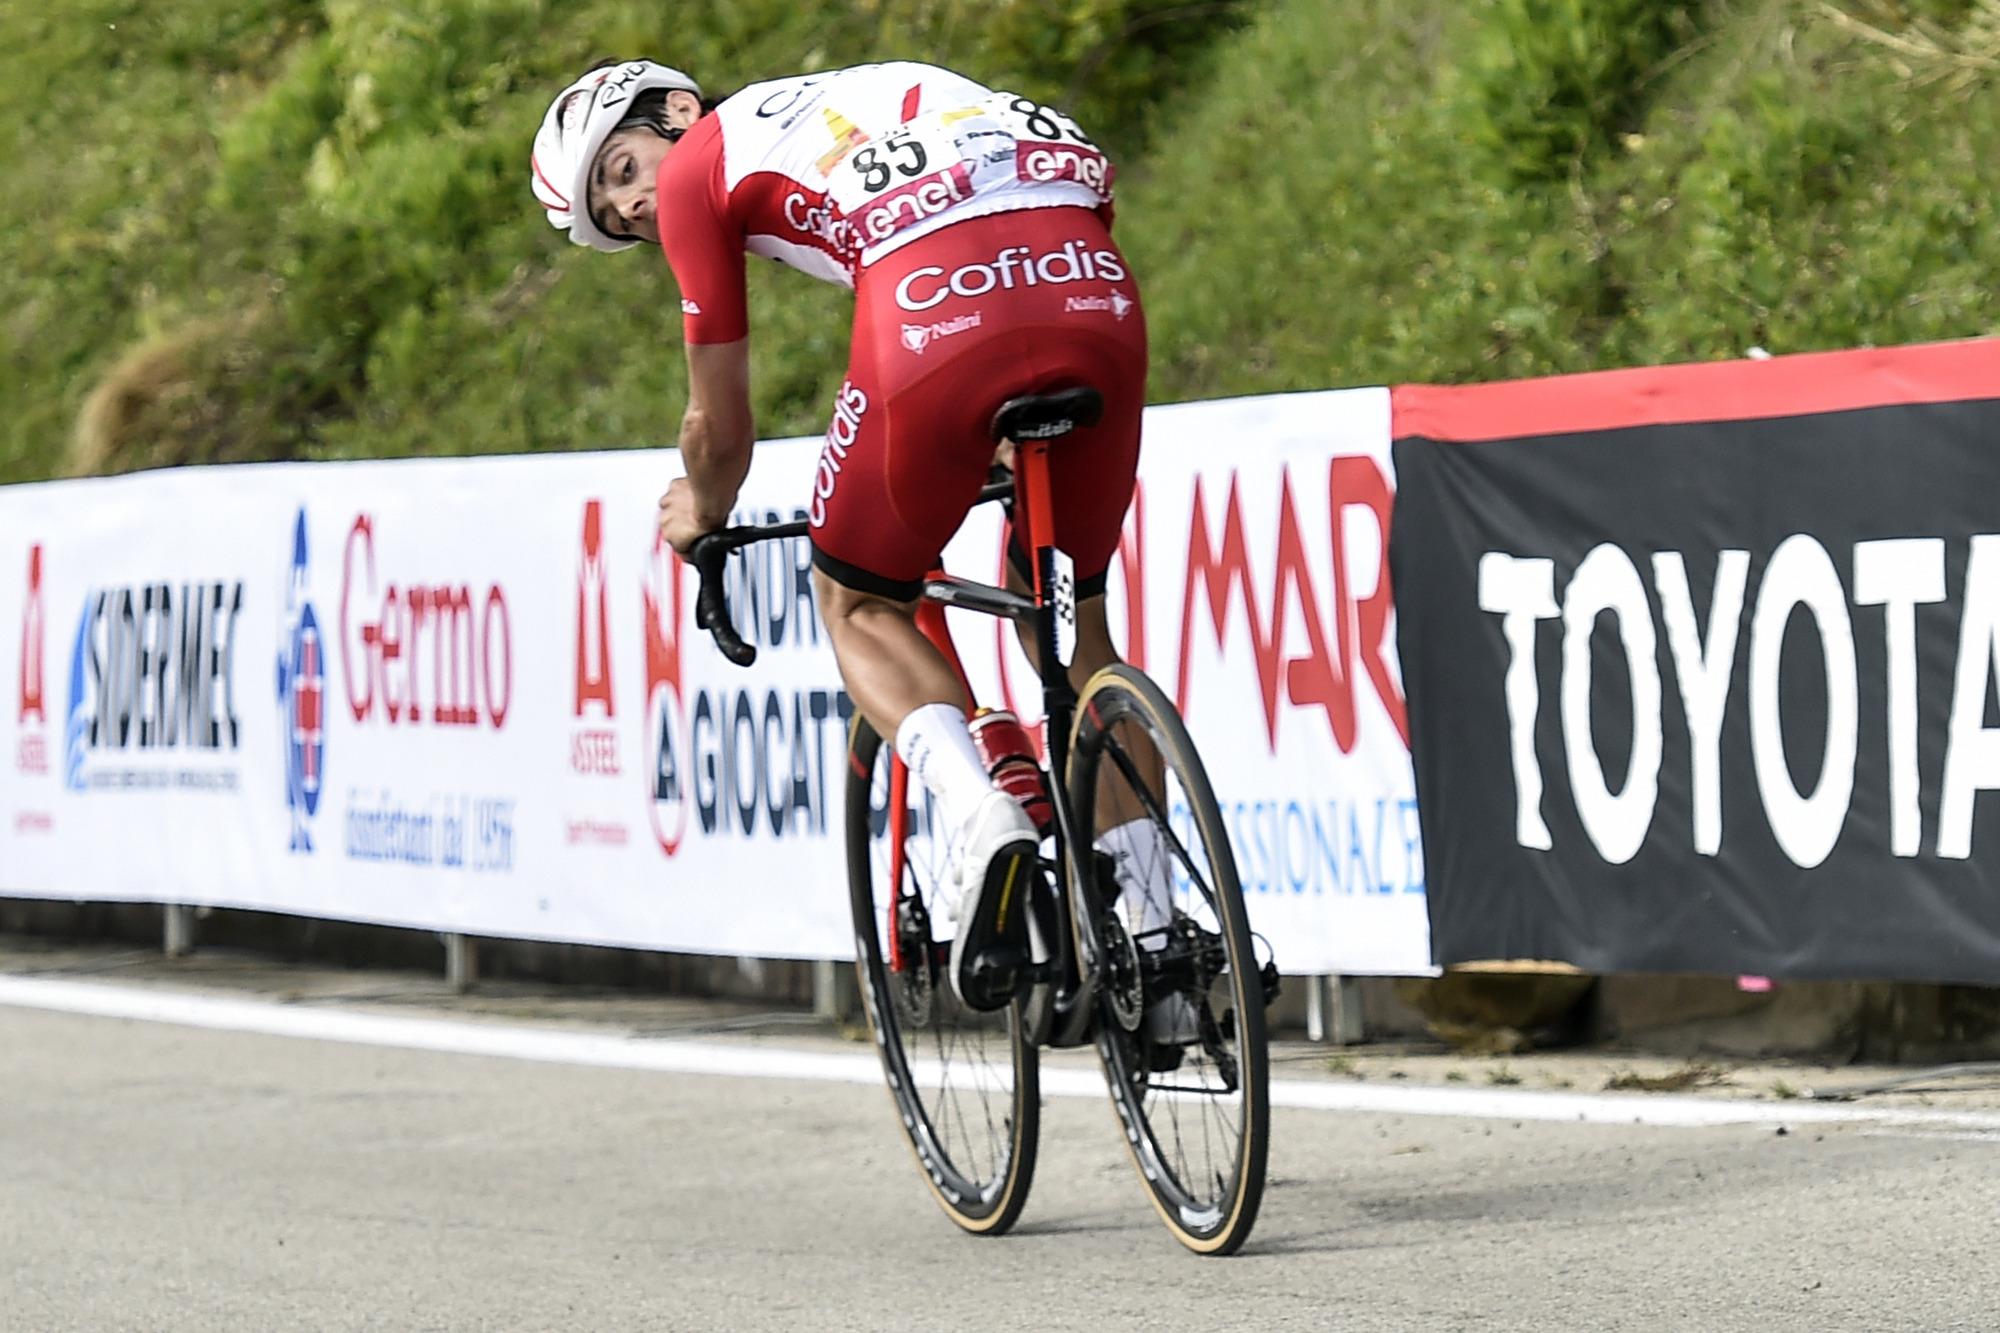 Giro dItalia 2021 104th Edition 8th stage Foggia Guardia Sanframondi 170 km 15052021 Victor Lafay FRA Cofidis photo Tommaso PelagalliBettiniPhoto2021